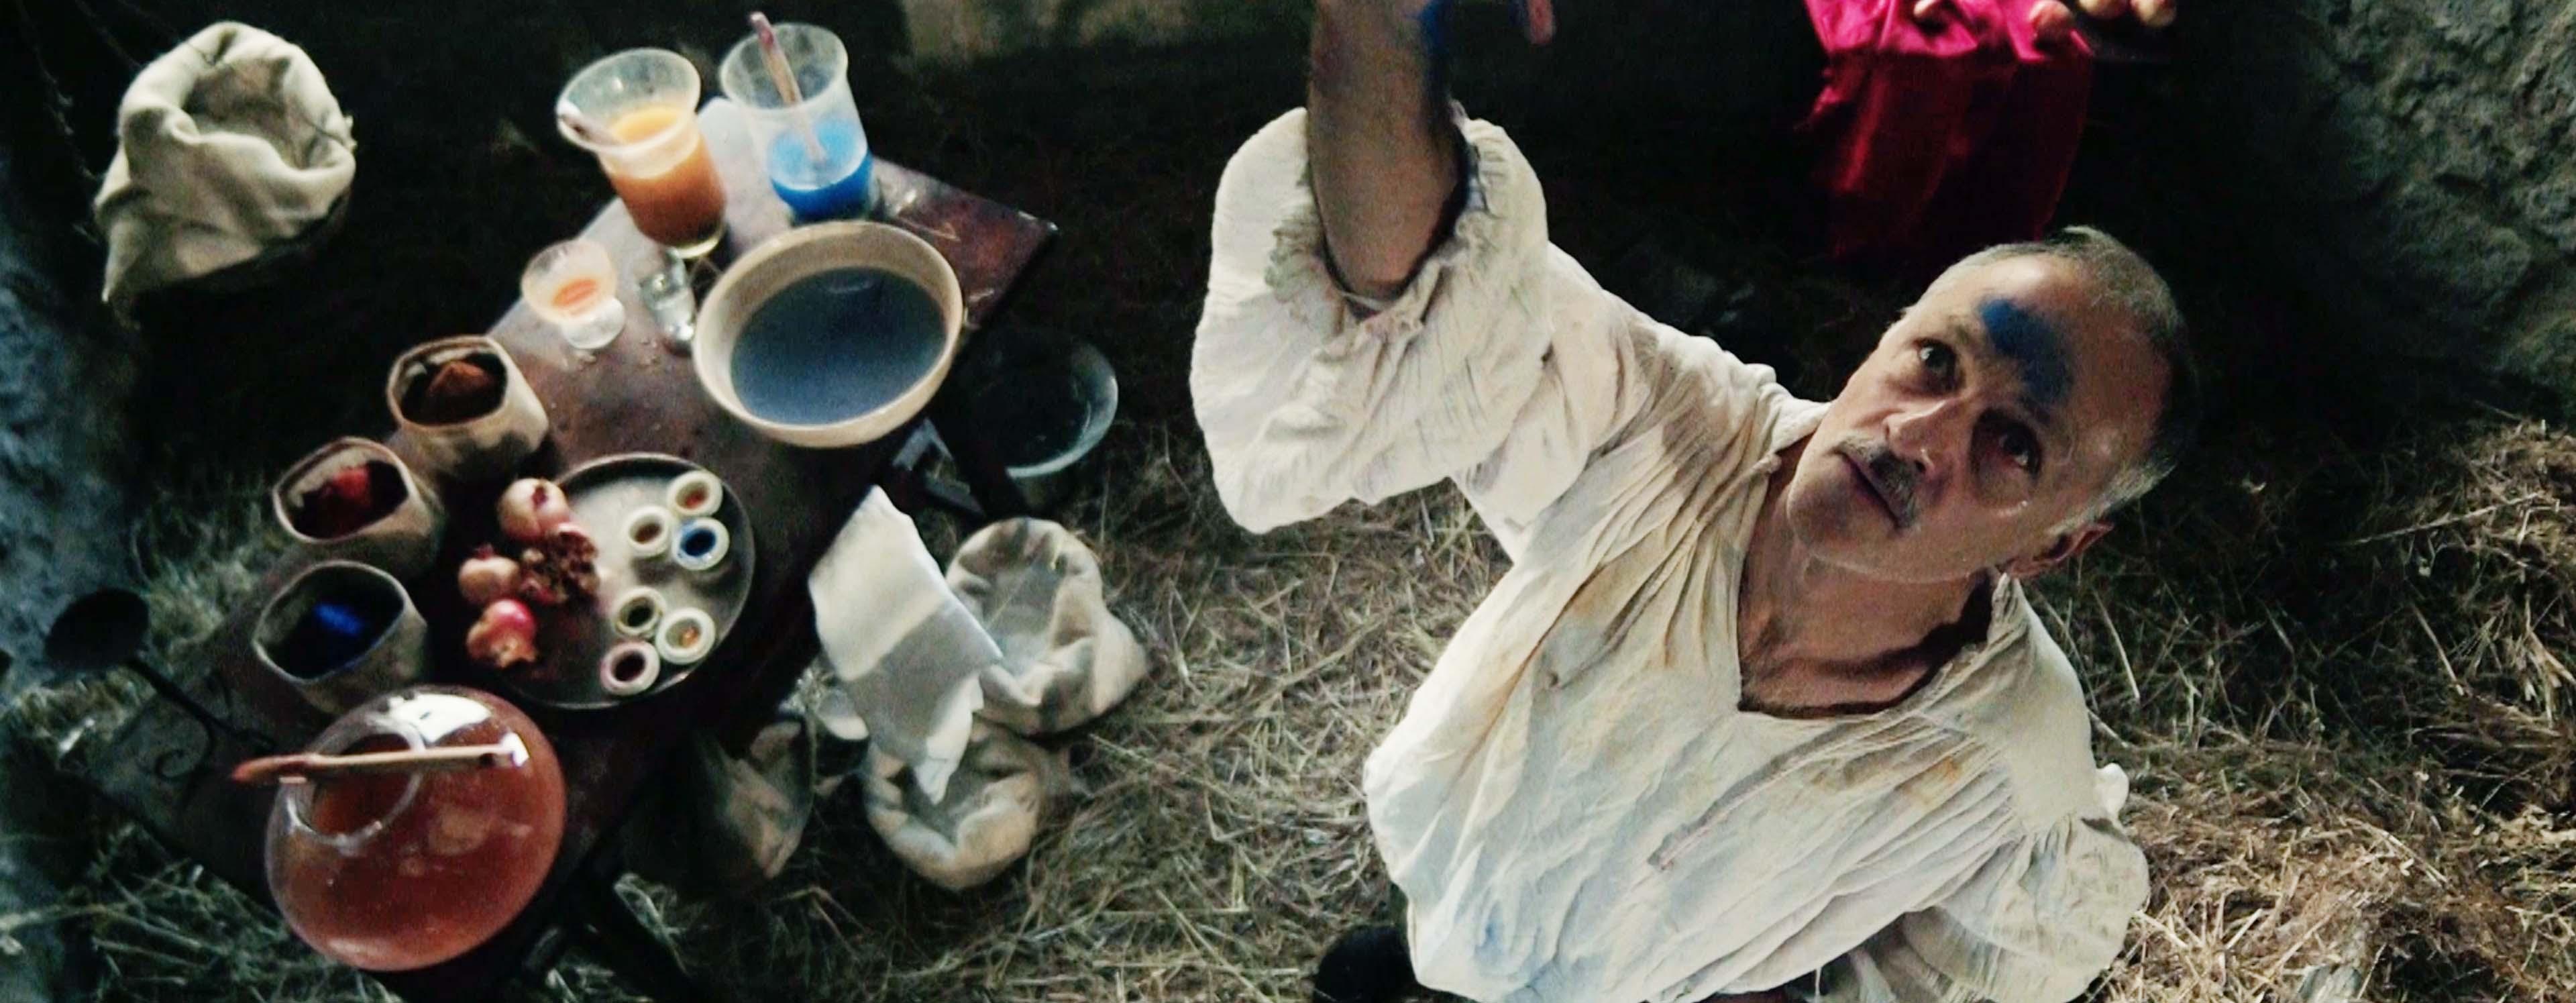 Michelangelo Entangled - Angelo Tanzi - CIclope film